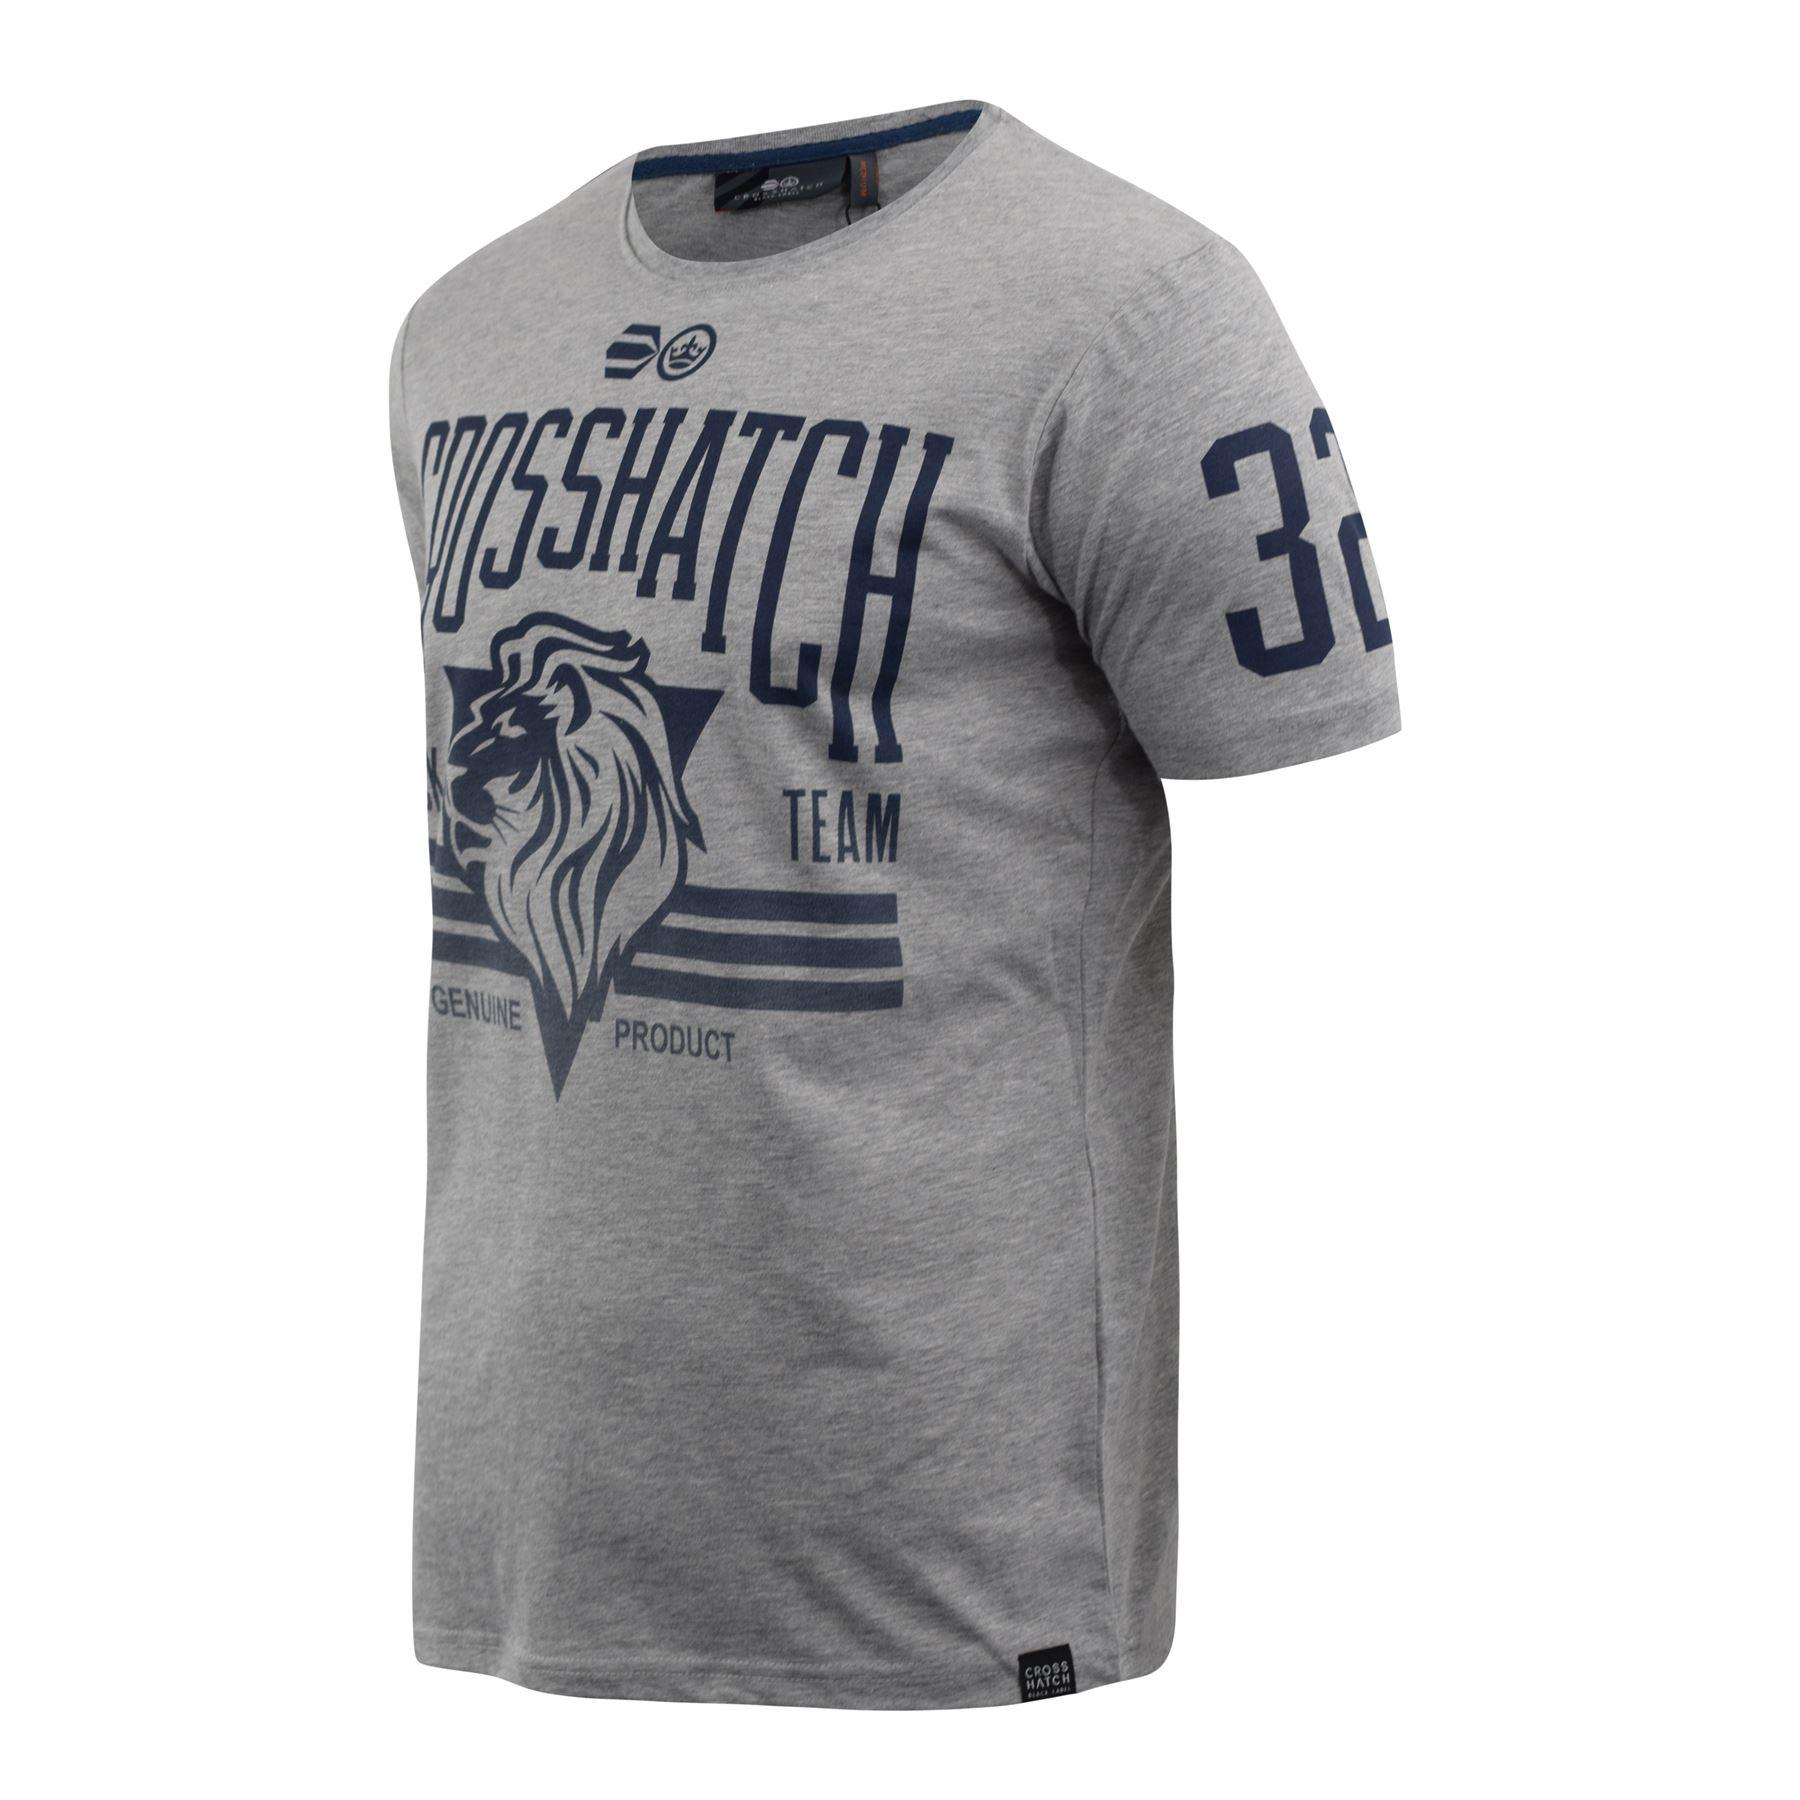 Mens-Crosshatch-T-Shirt-Contrast-Short-Sleeve-Tee-Top-Penycoat thumbnail 6